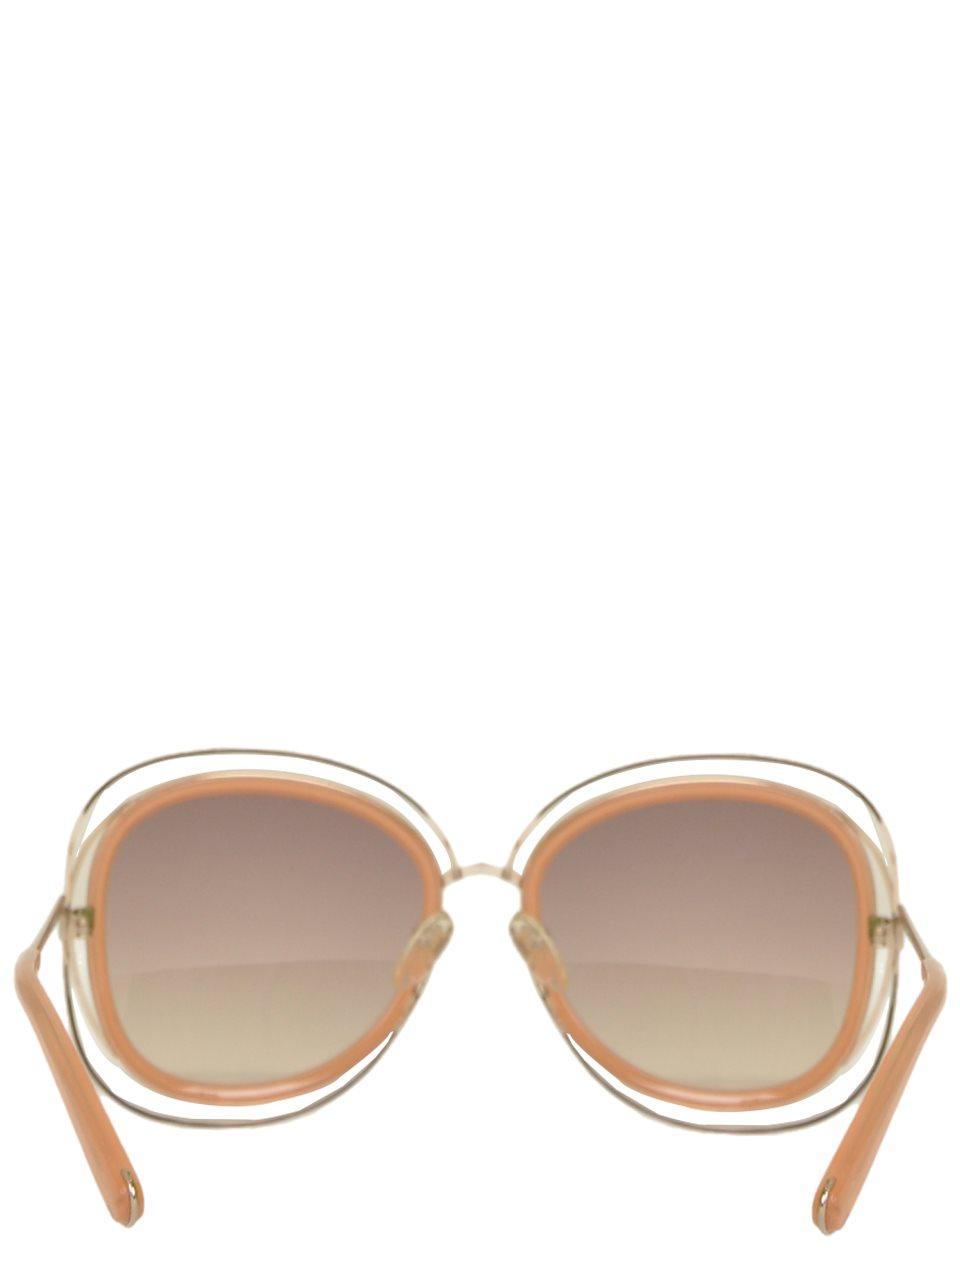 Chloe - Sunglasses - Image 2 of 5